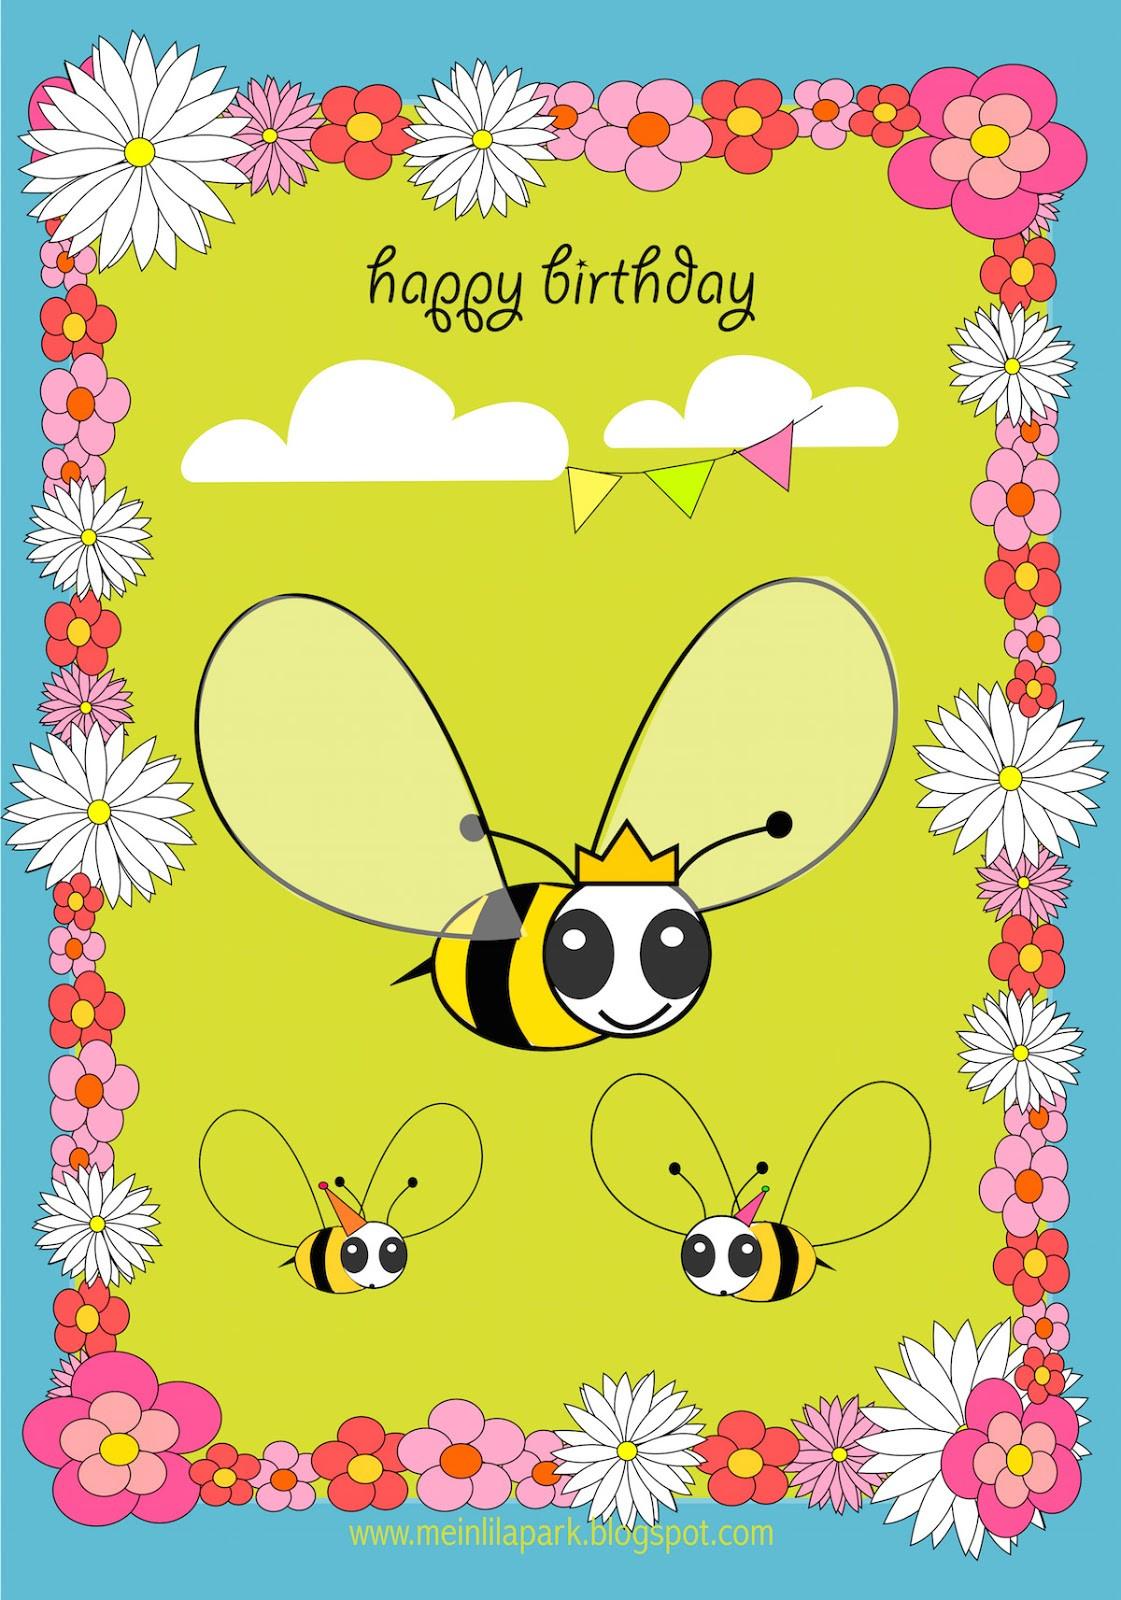 Free Printable Kids Birthday Cards  Free printable Happy Birthday card for kids ausdruckbare